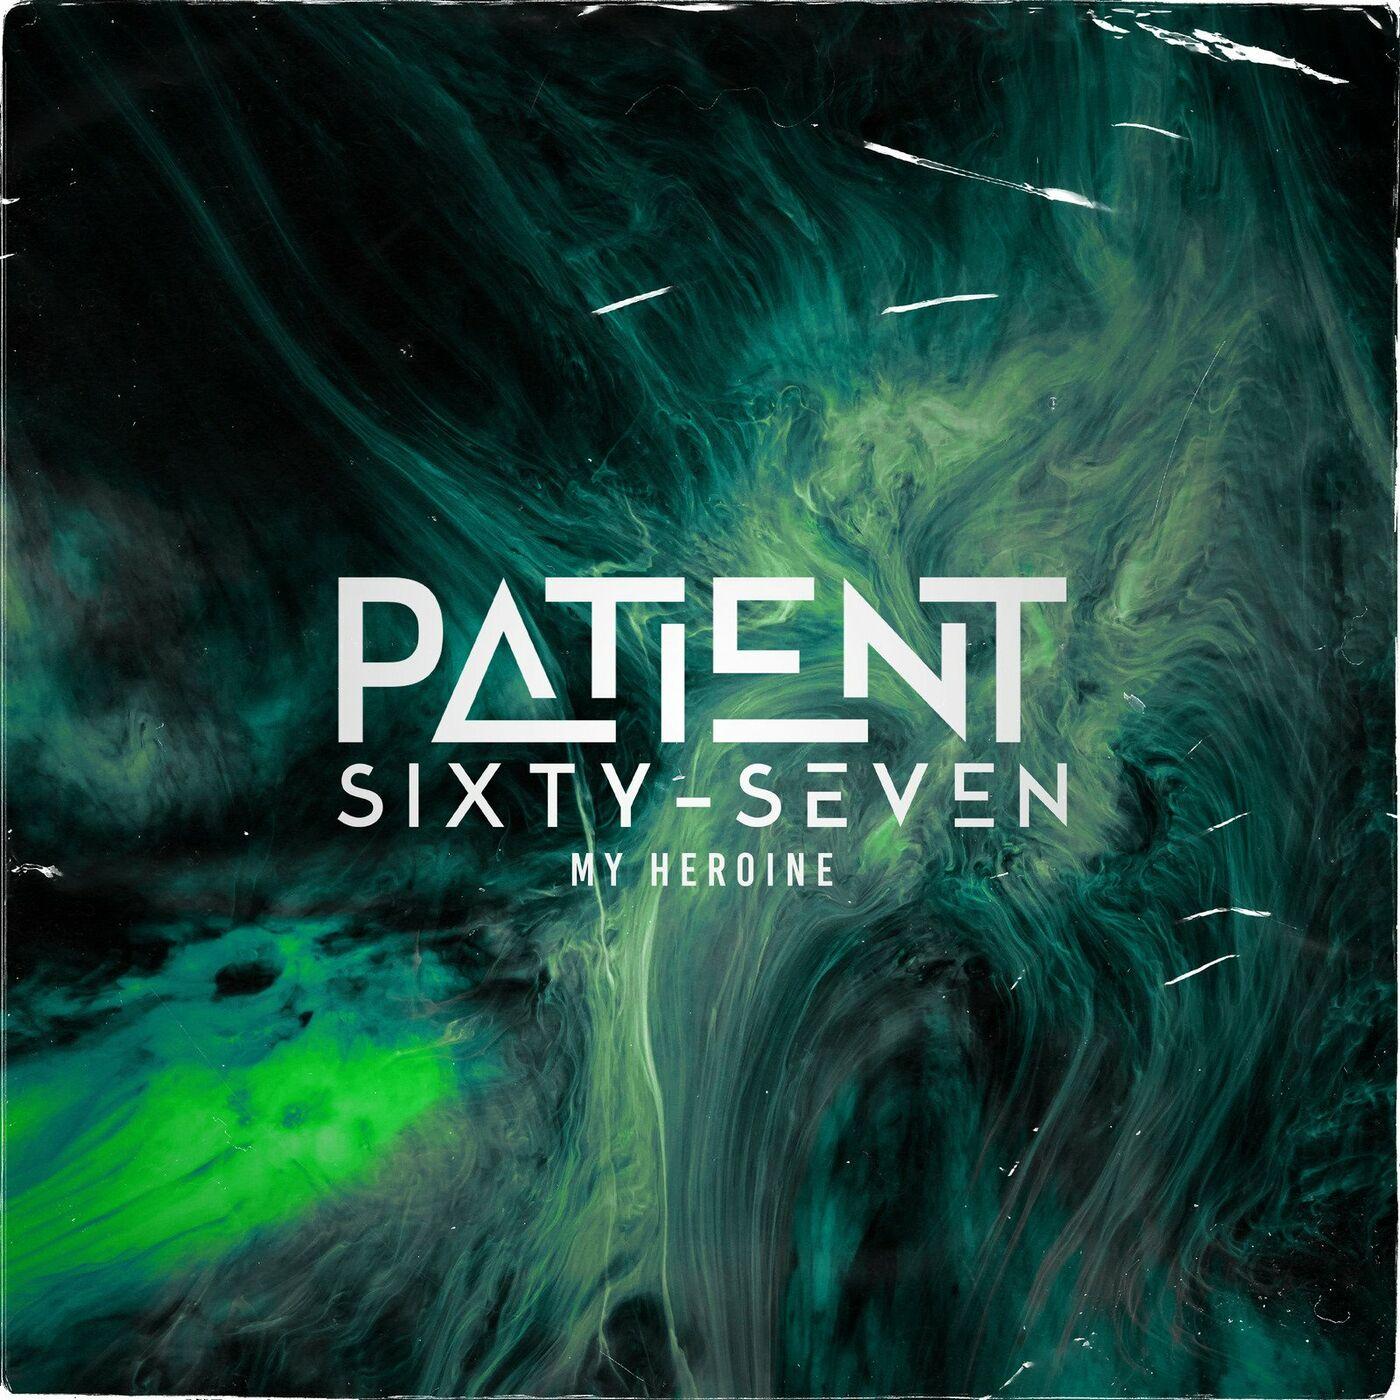 Patient Sixty-Seven - My Heroine [single] (2020)